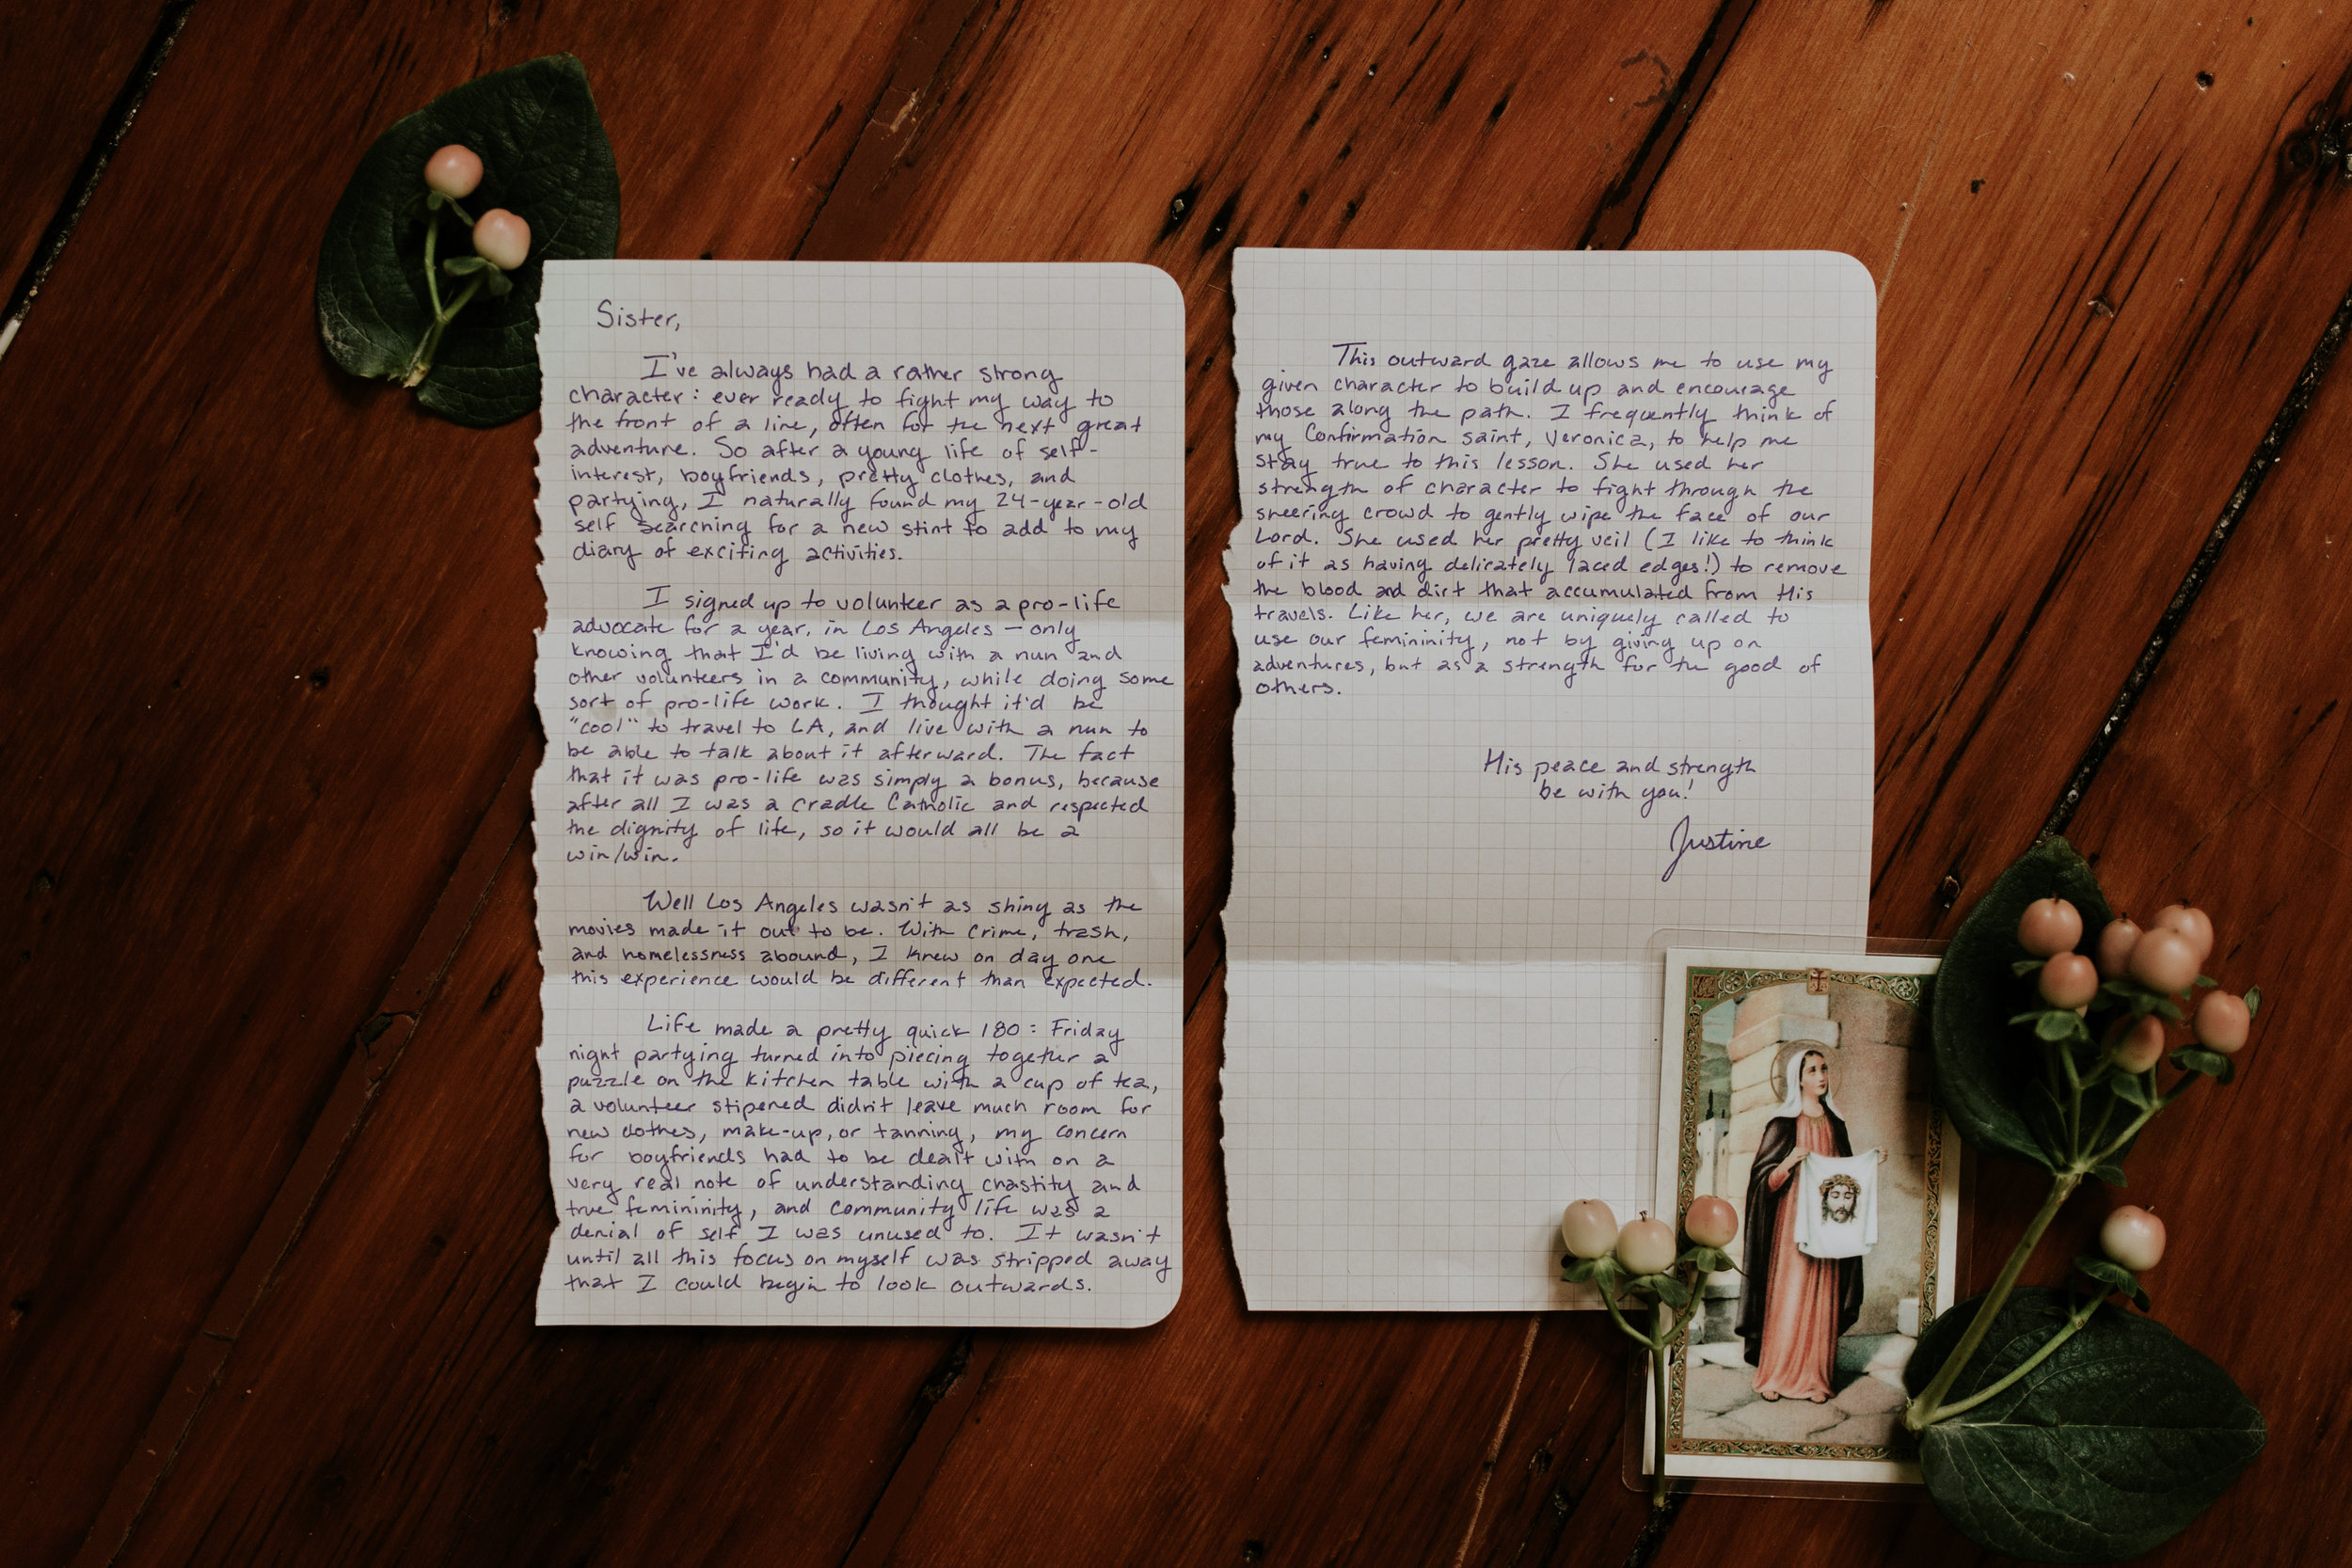 The-Catholic-Woman-Justine-Morris-Letter-Saint-Veronica